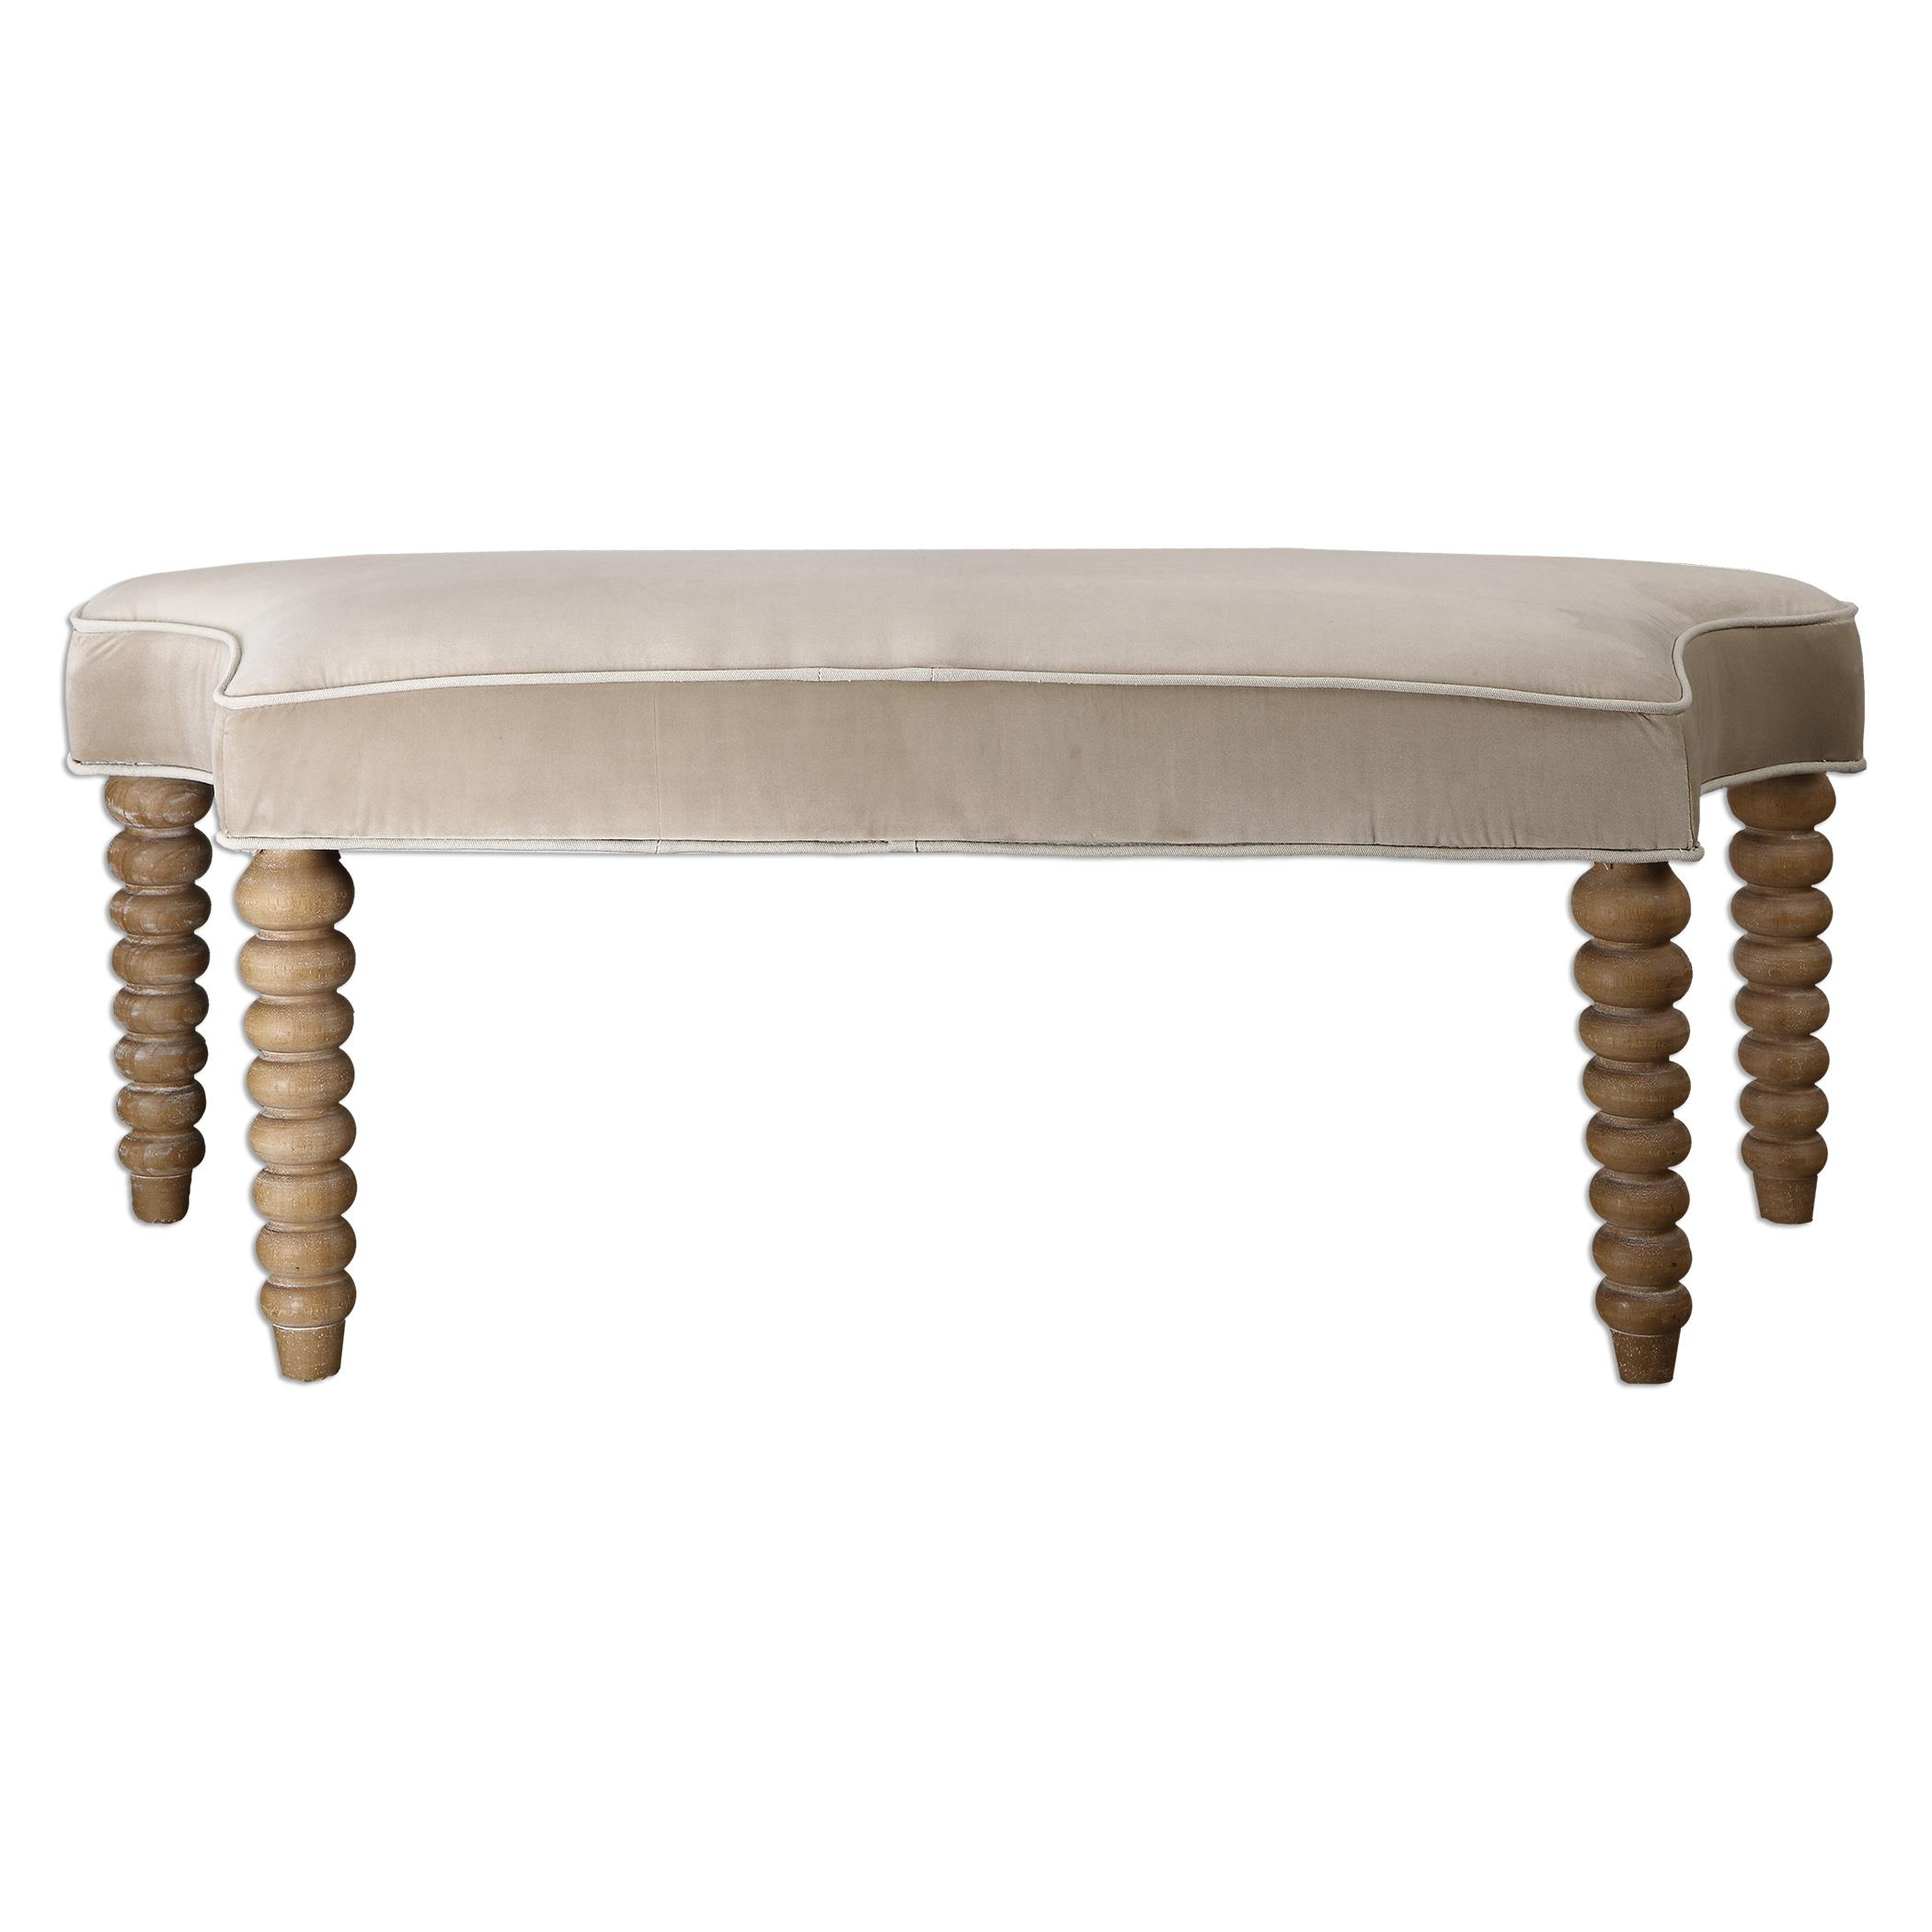 Uttermost Accent Furniture Parlan Beige Bench - Item Number: 23248